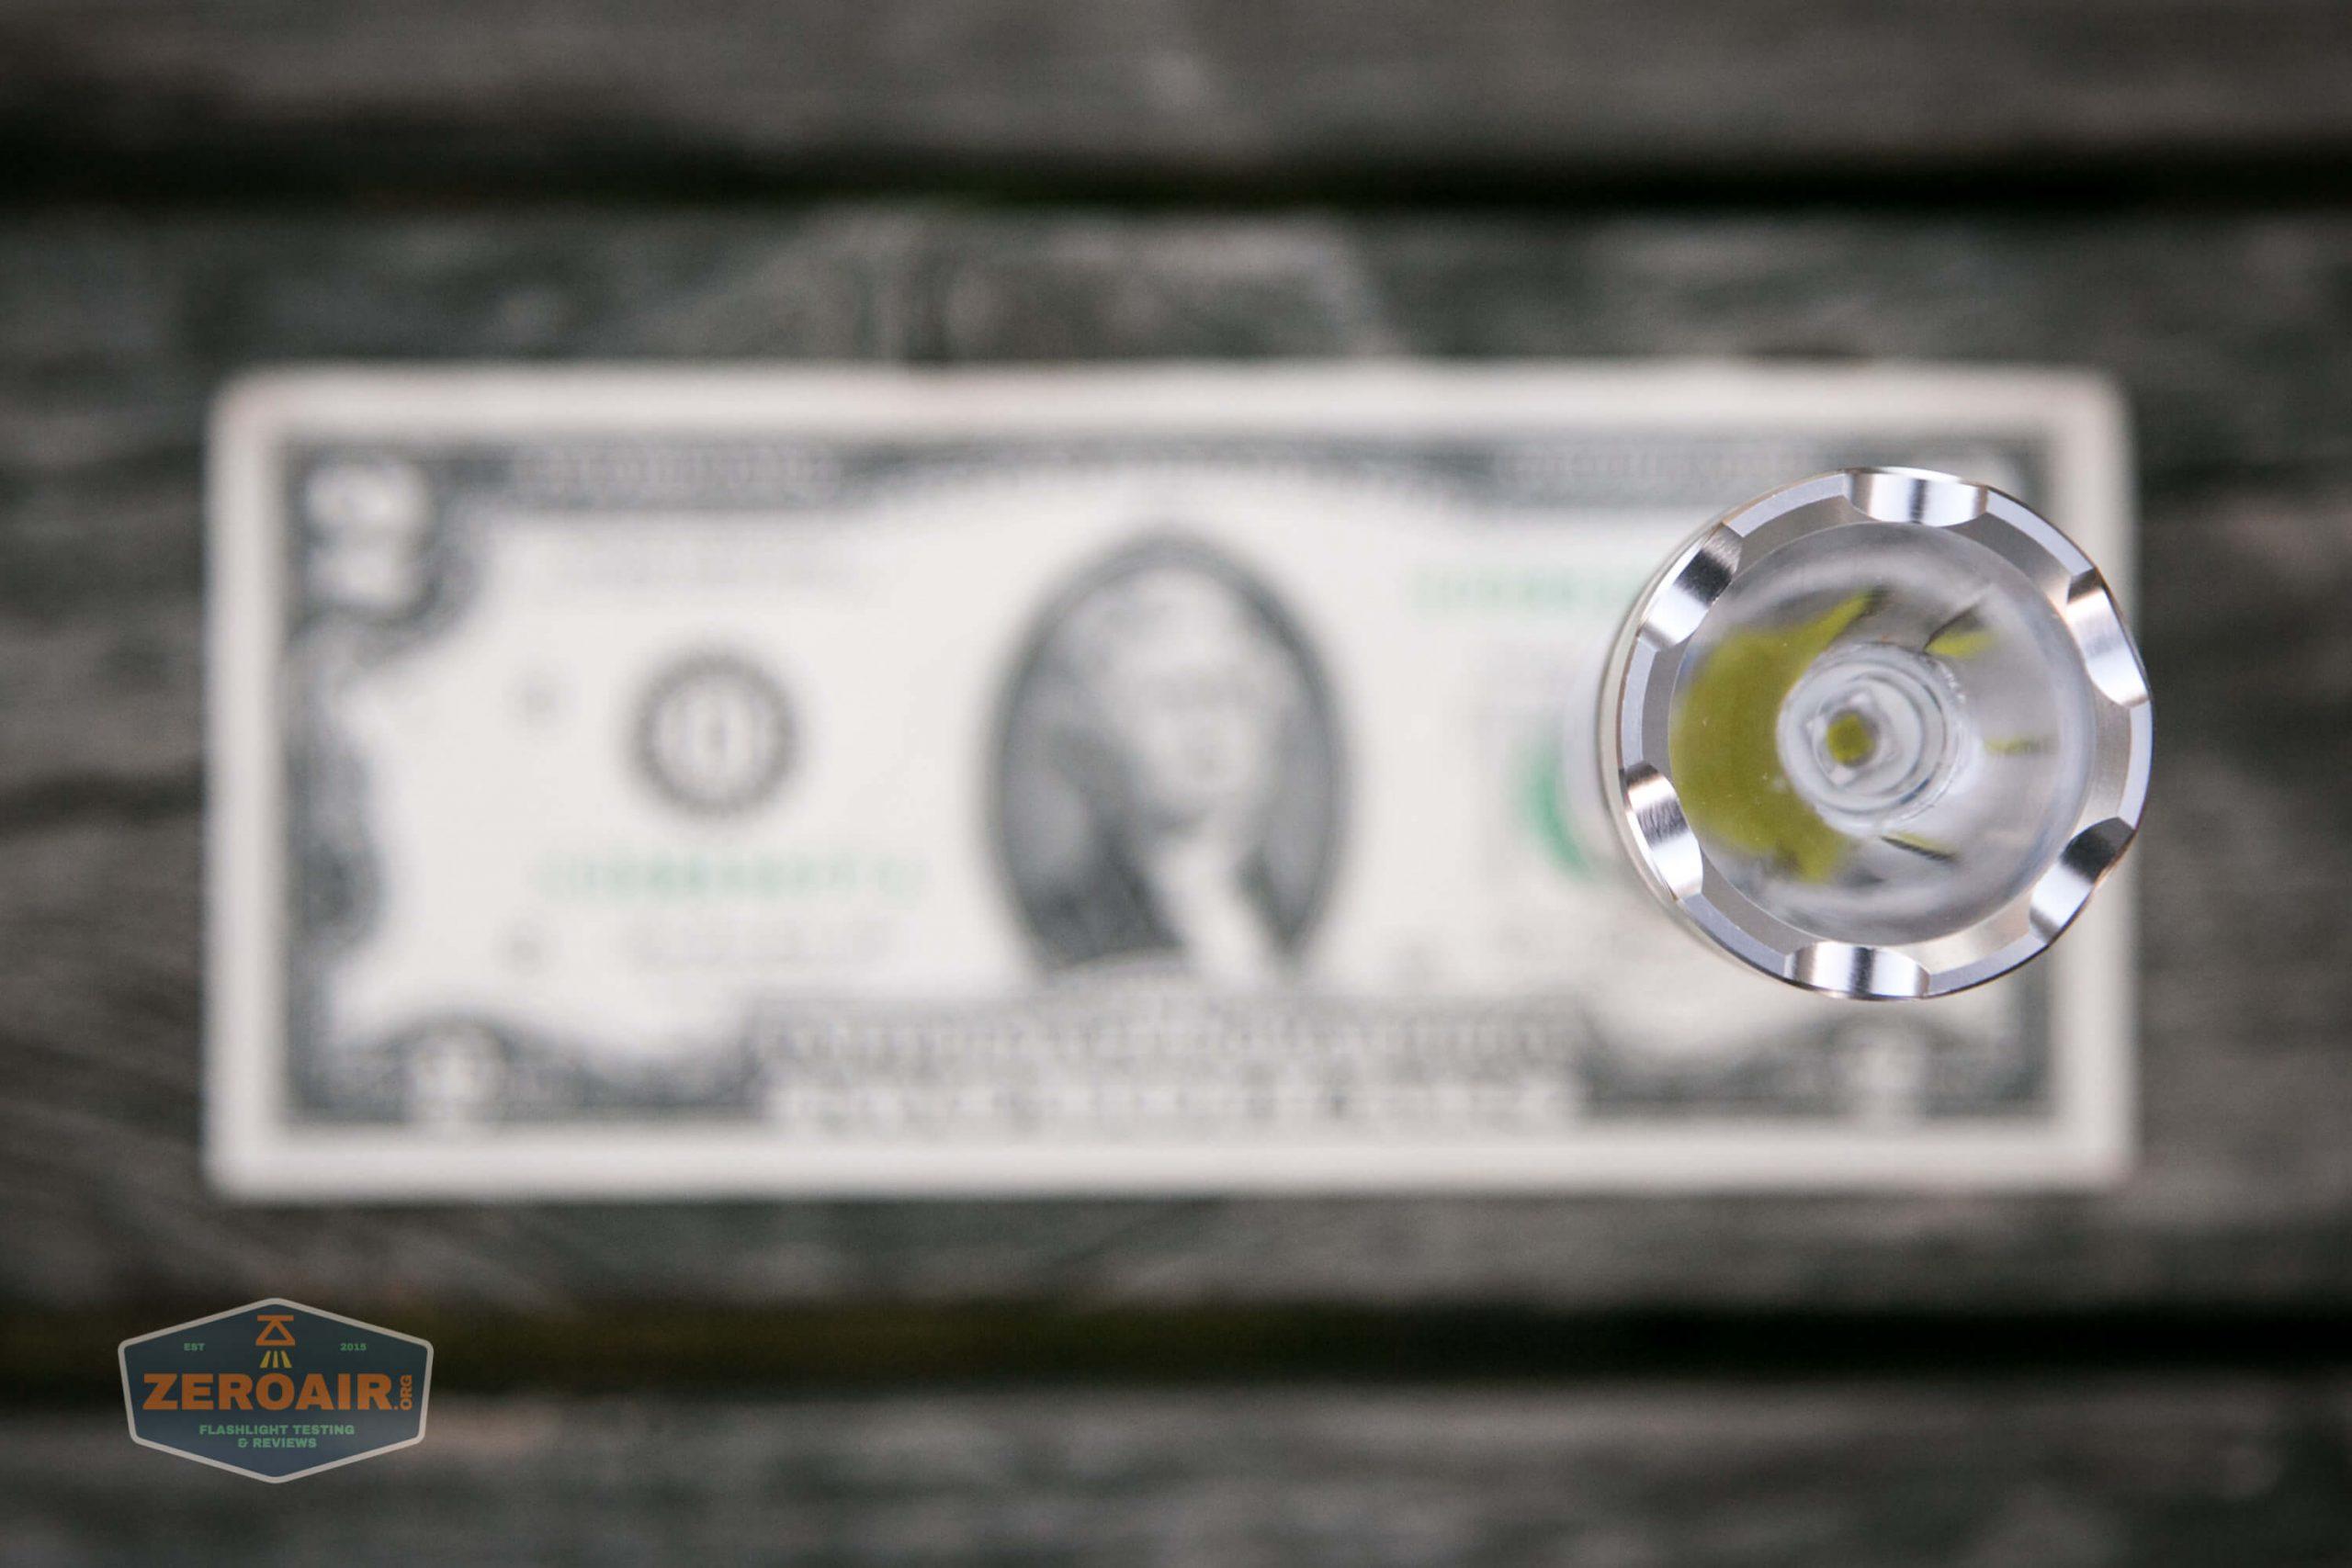 fireflylite e01 luminus sst-40 21700 size on two dollar bill 4